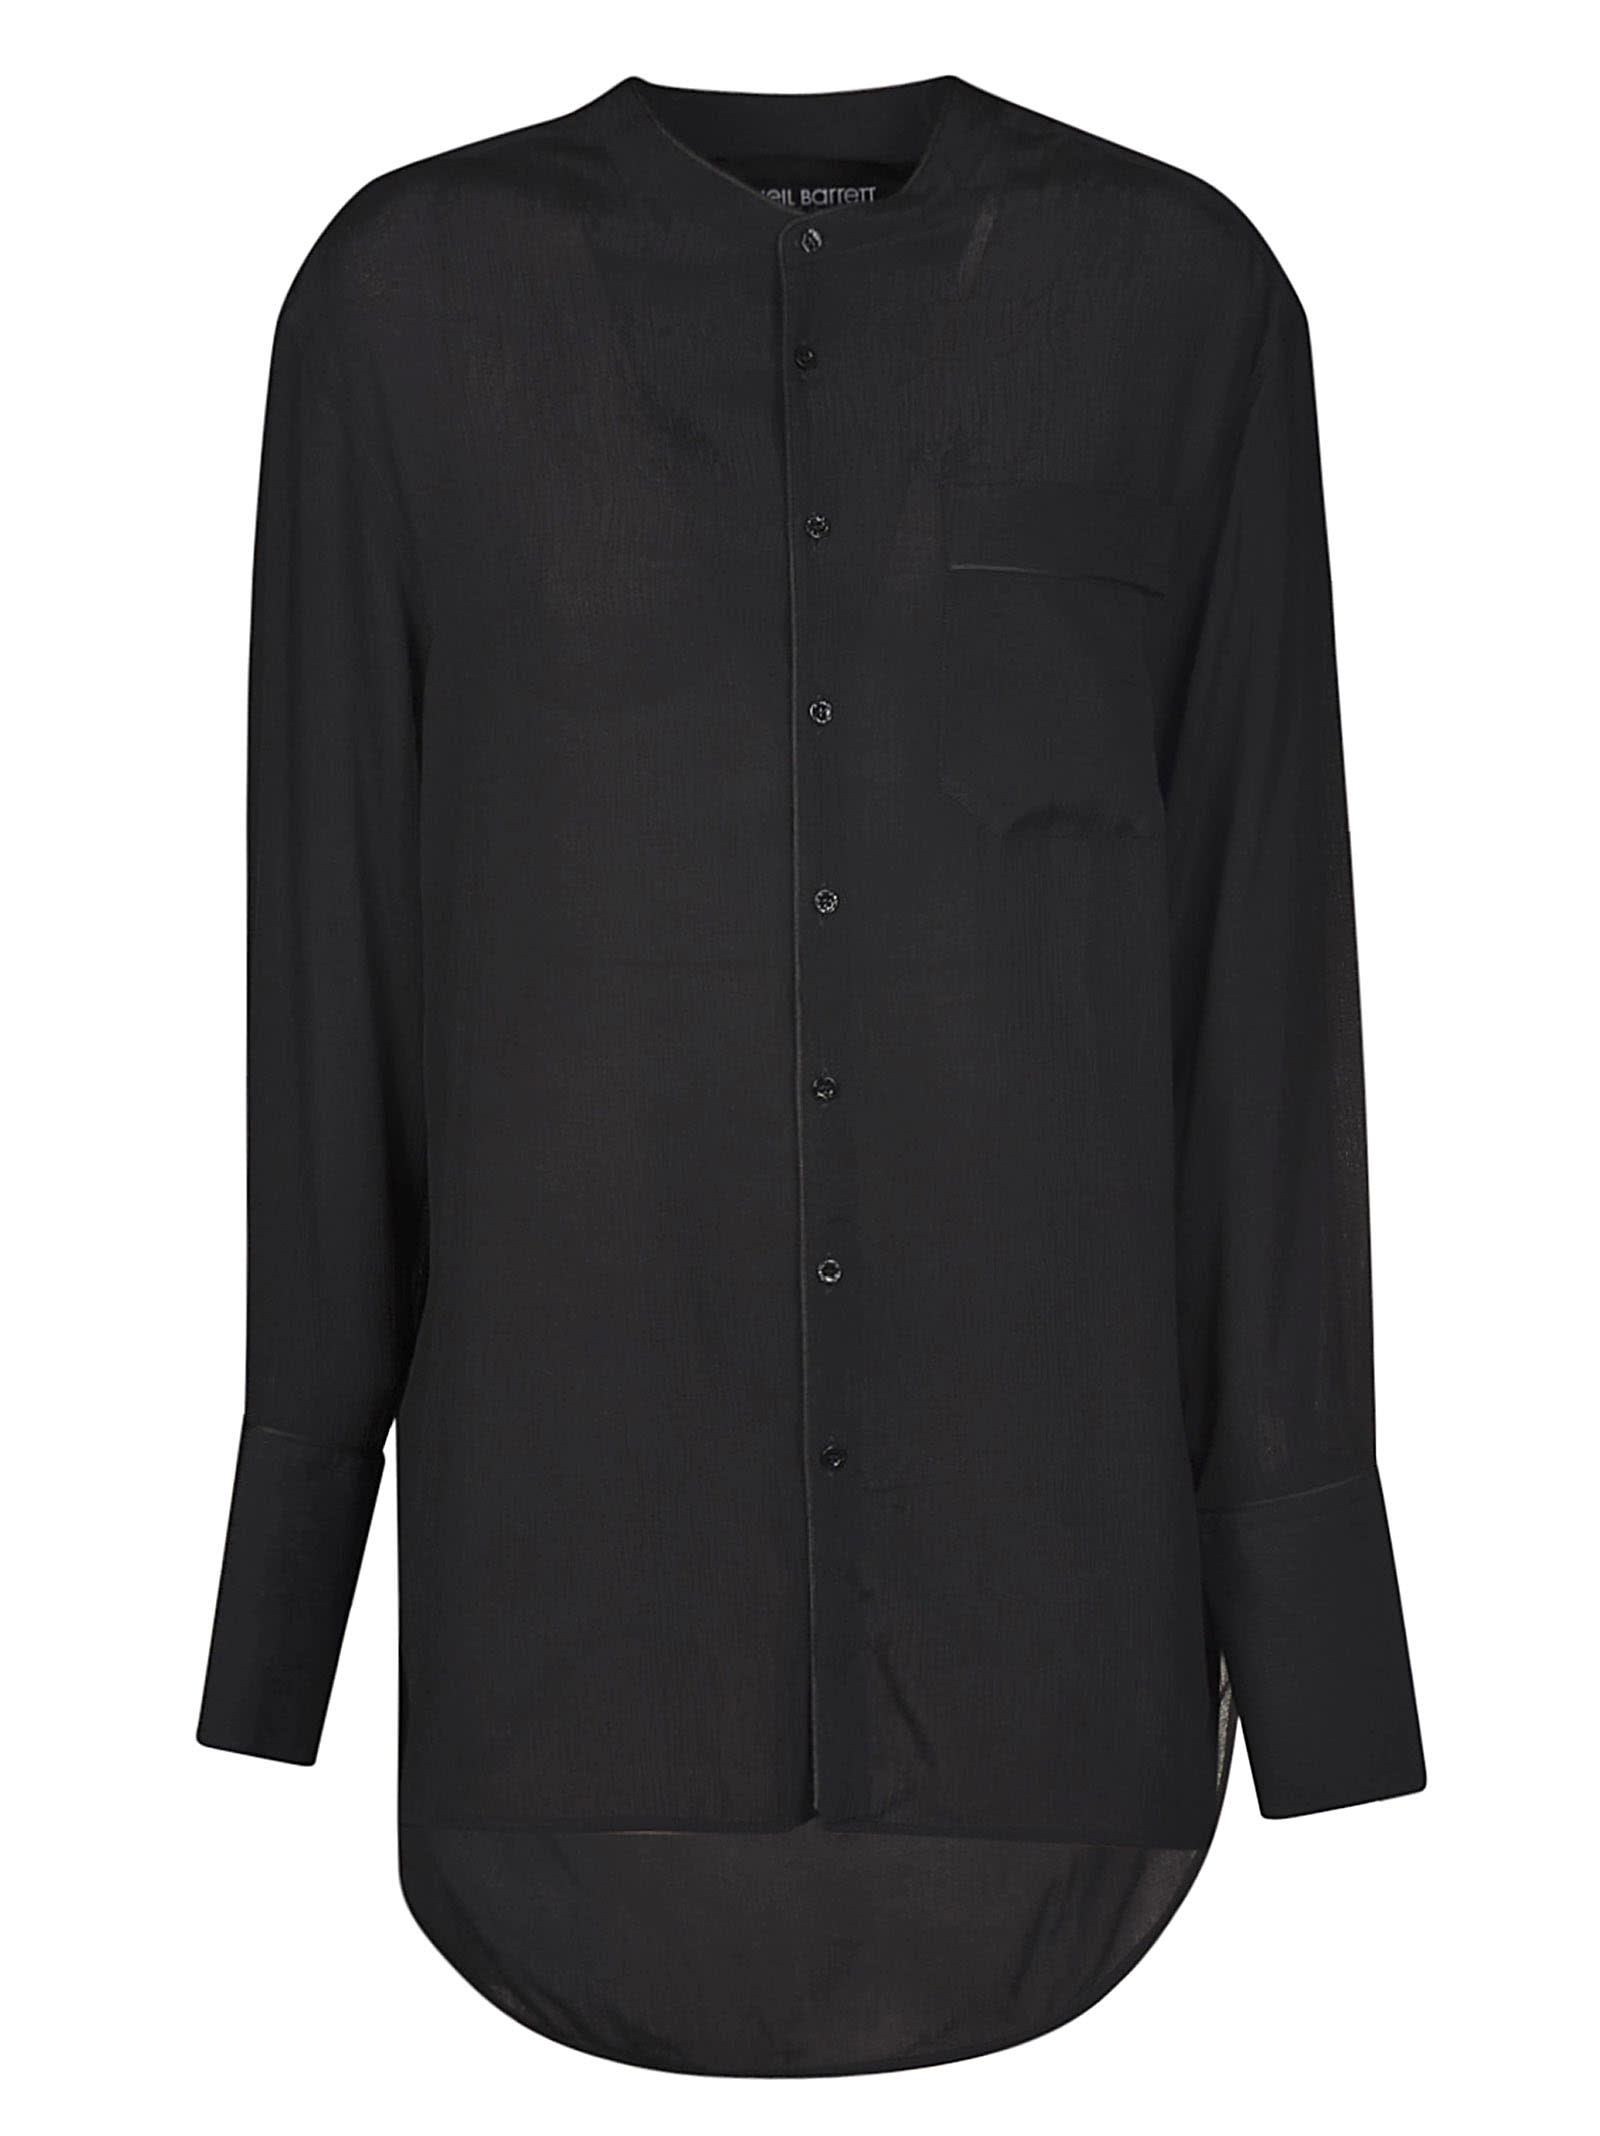 Neil Barrett Oversized Lace Shirt